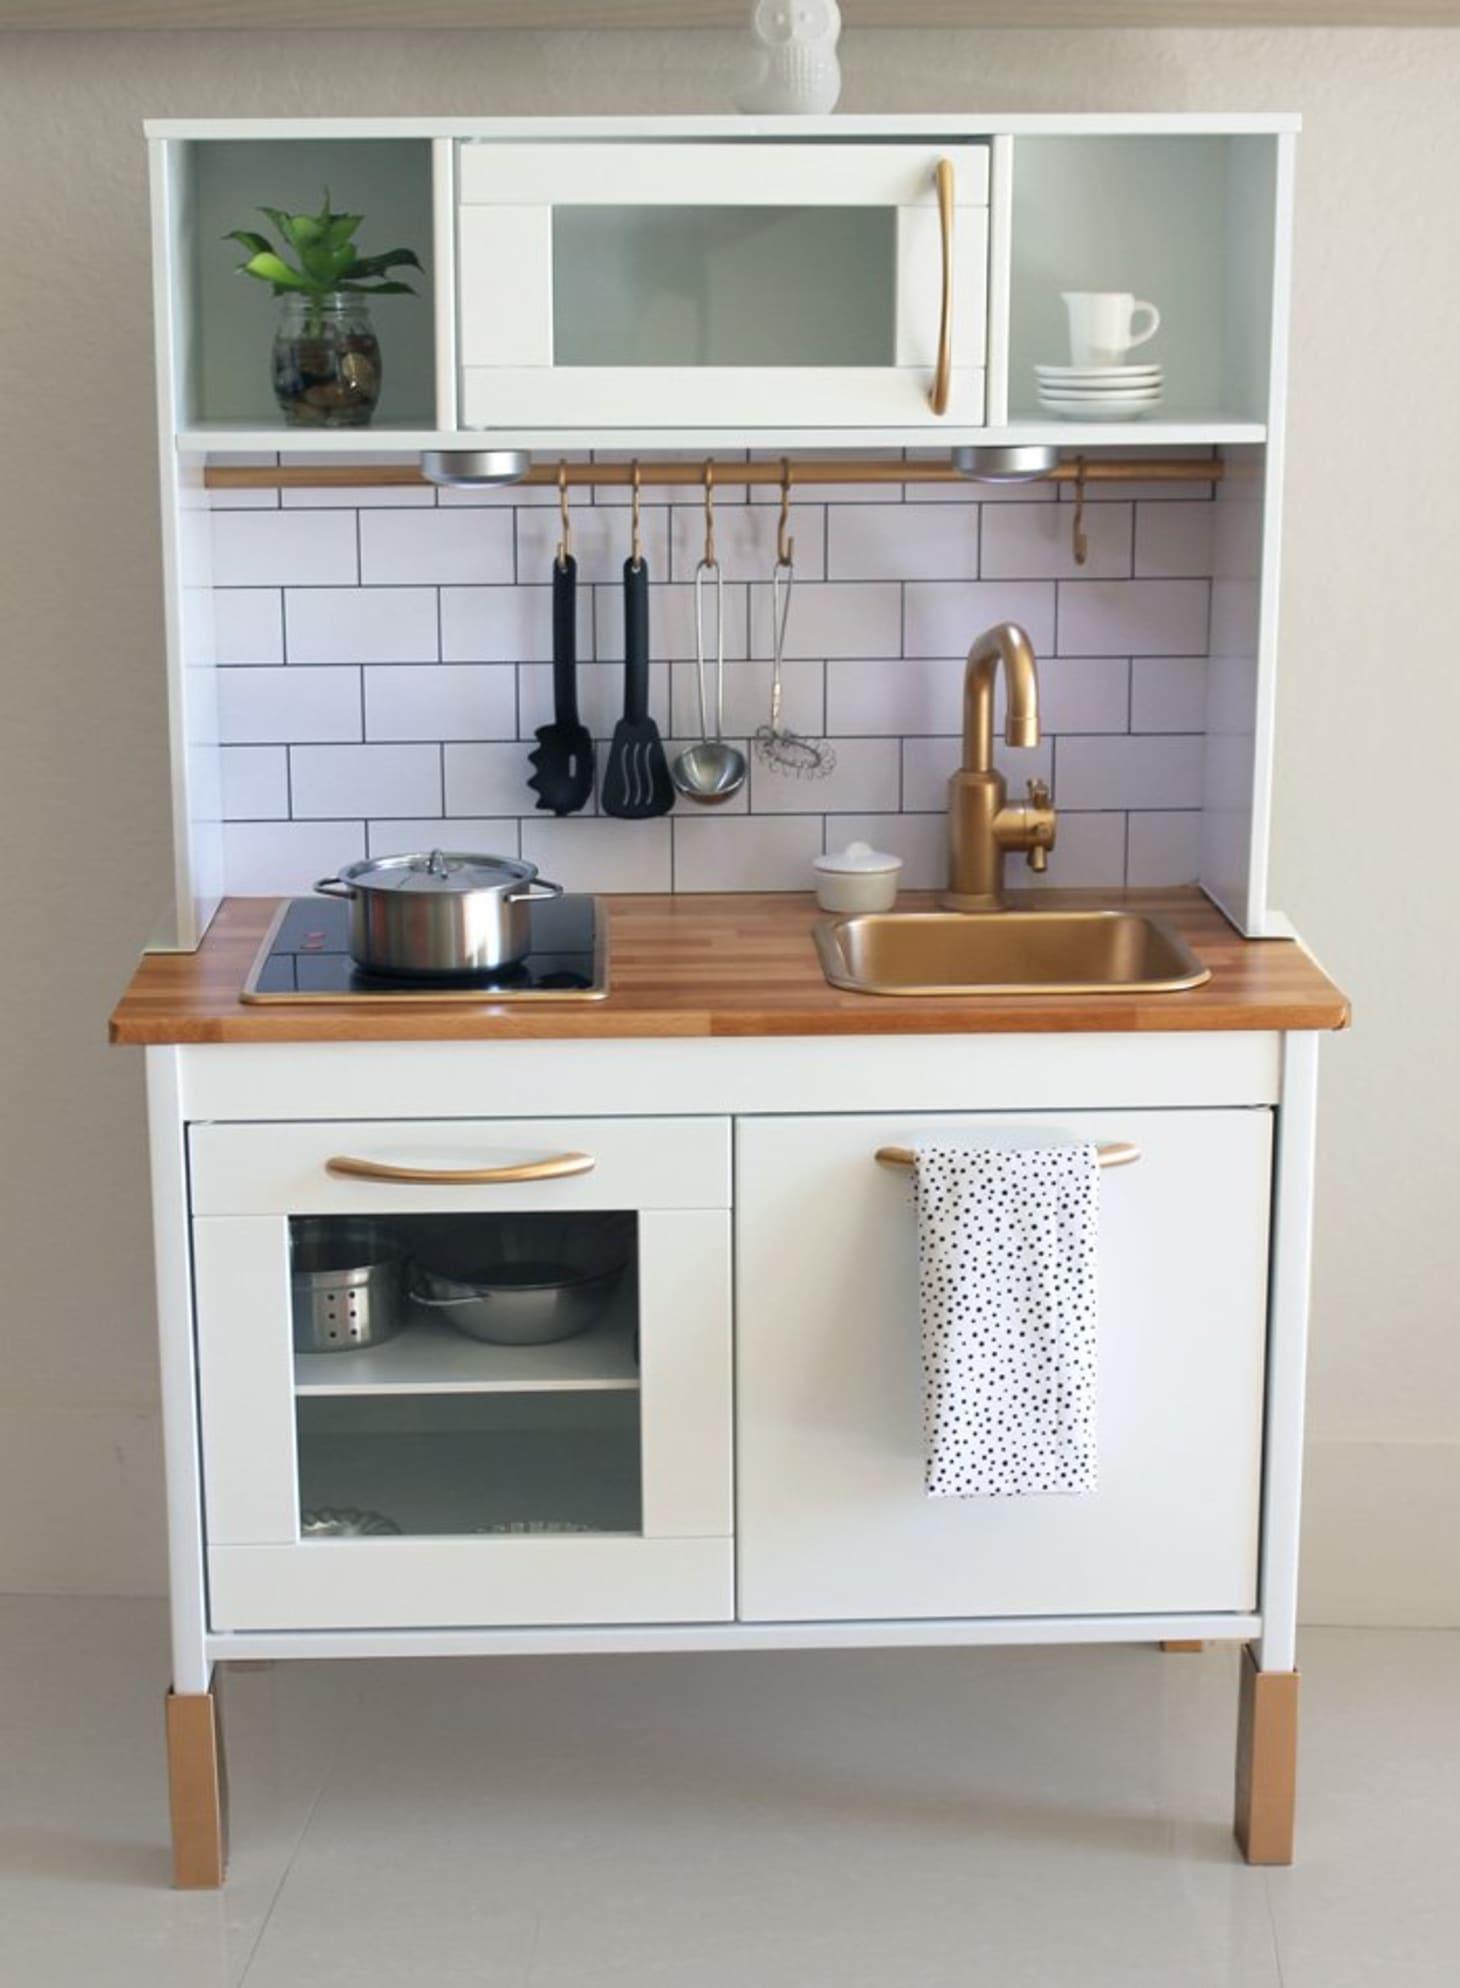 IKEA Play Kitchen - 15 DUKTIG Hacks